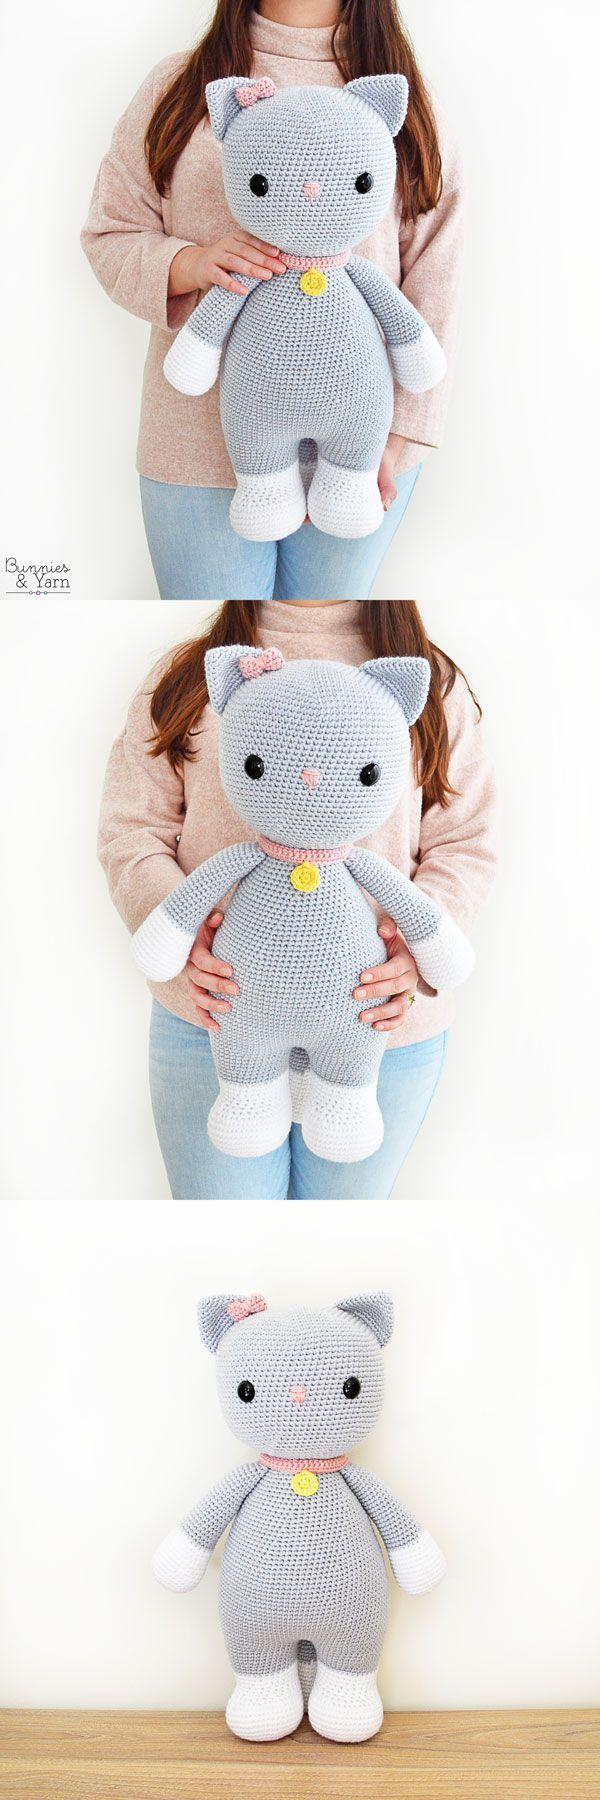 Playing Cats Crochet Amigurumi Pattern Crochet pattern by Little ... | 1800x600